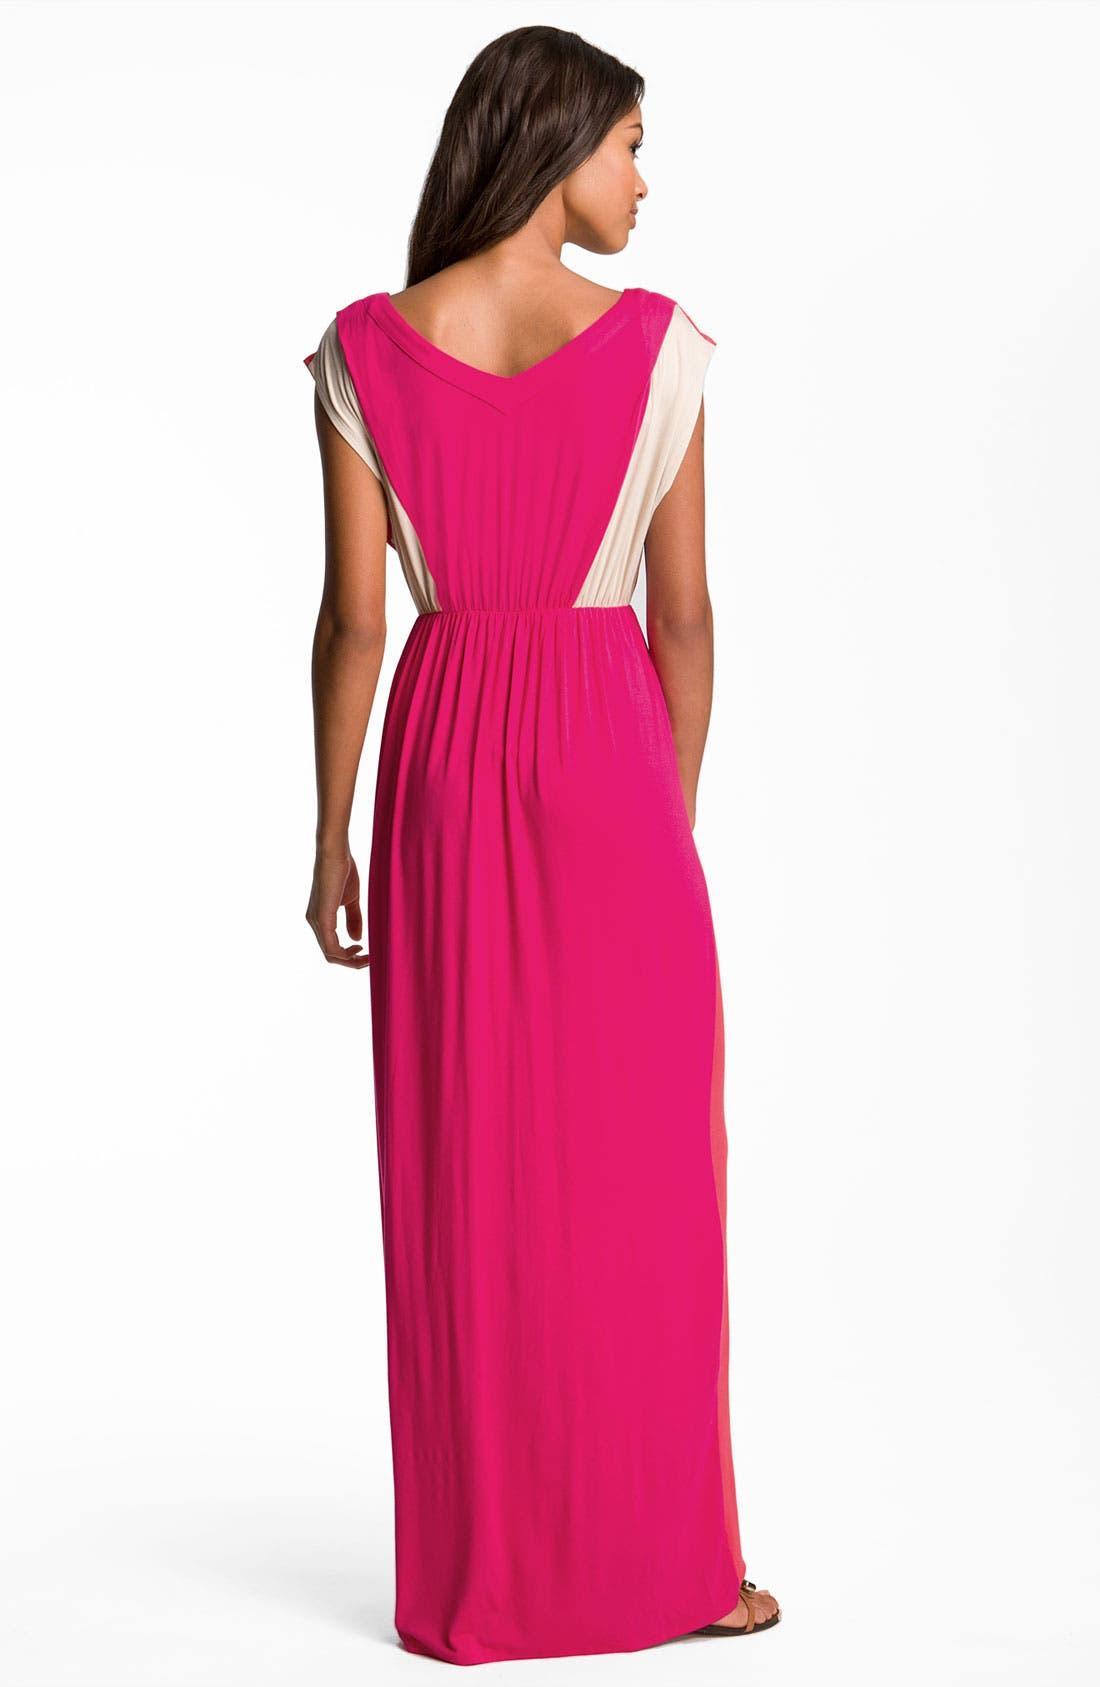 Alternate Image 2  - Felicity & Coco Contrast Trim Colorblock Jersey Maxi Dress (Nordstrom Exclusive)